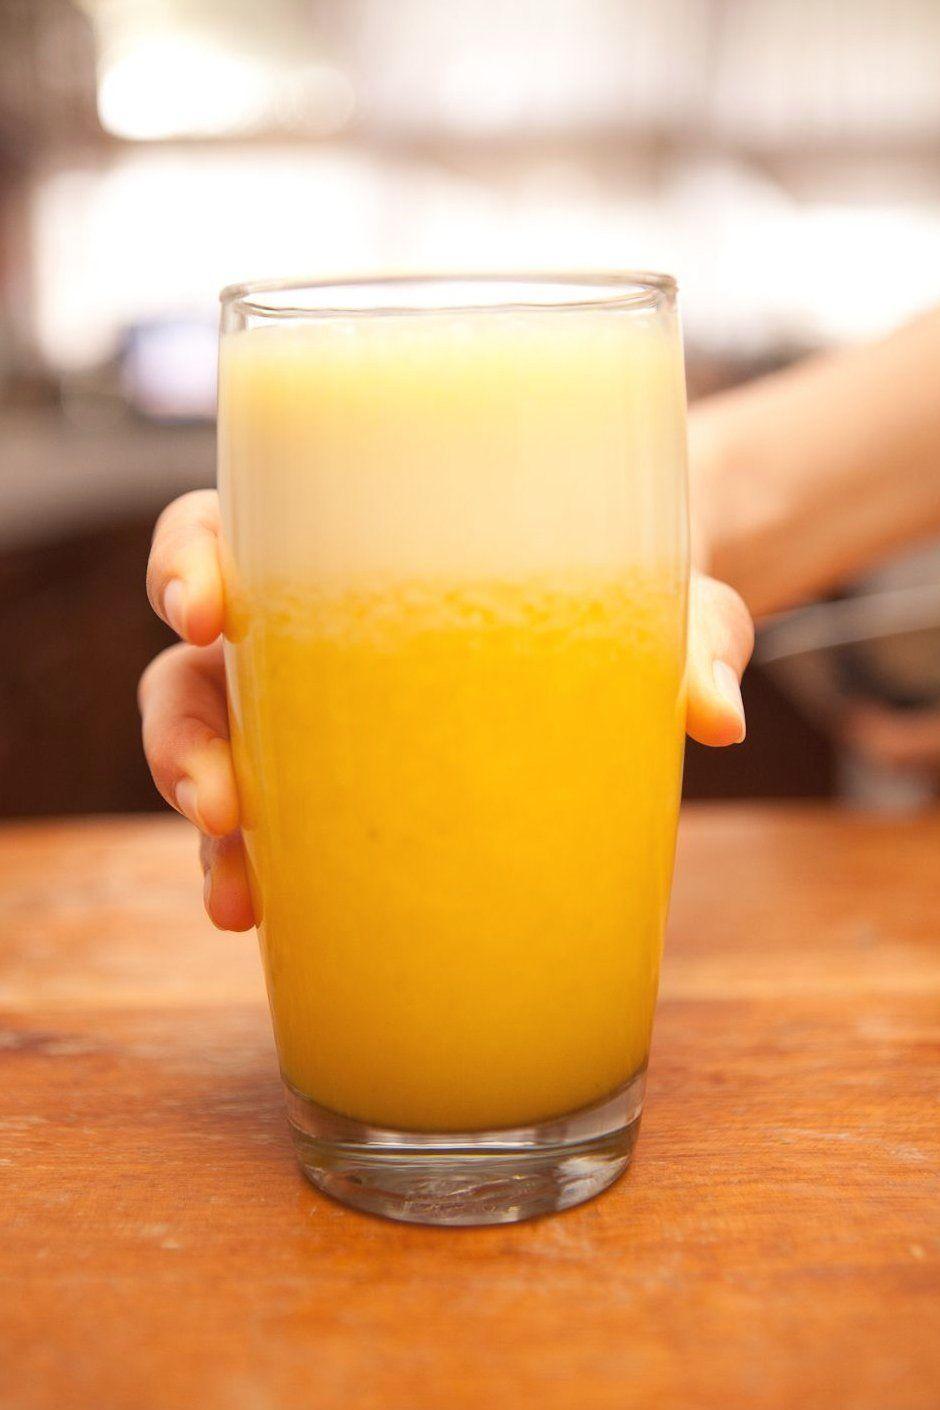 How To Make Pineapple Juice In 2020 Pineapple Juice Healthy Juices Pinapple Juice